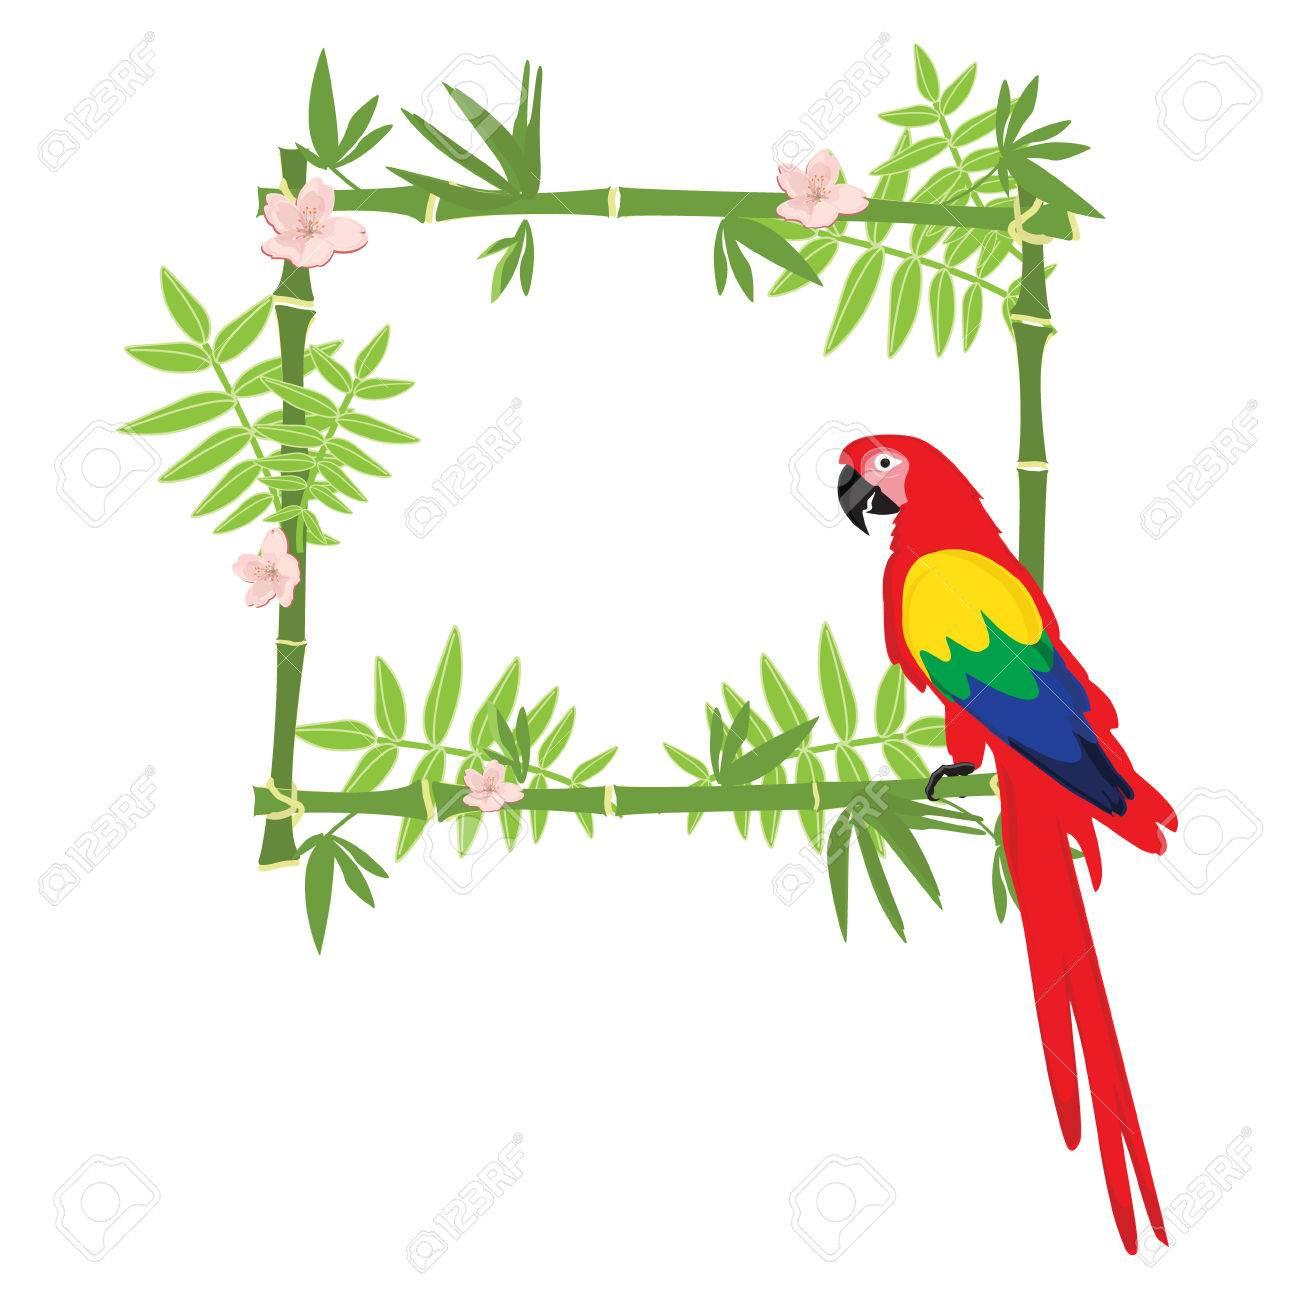 parrot clipart border